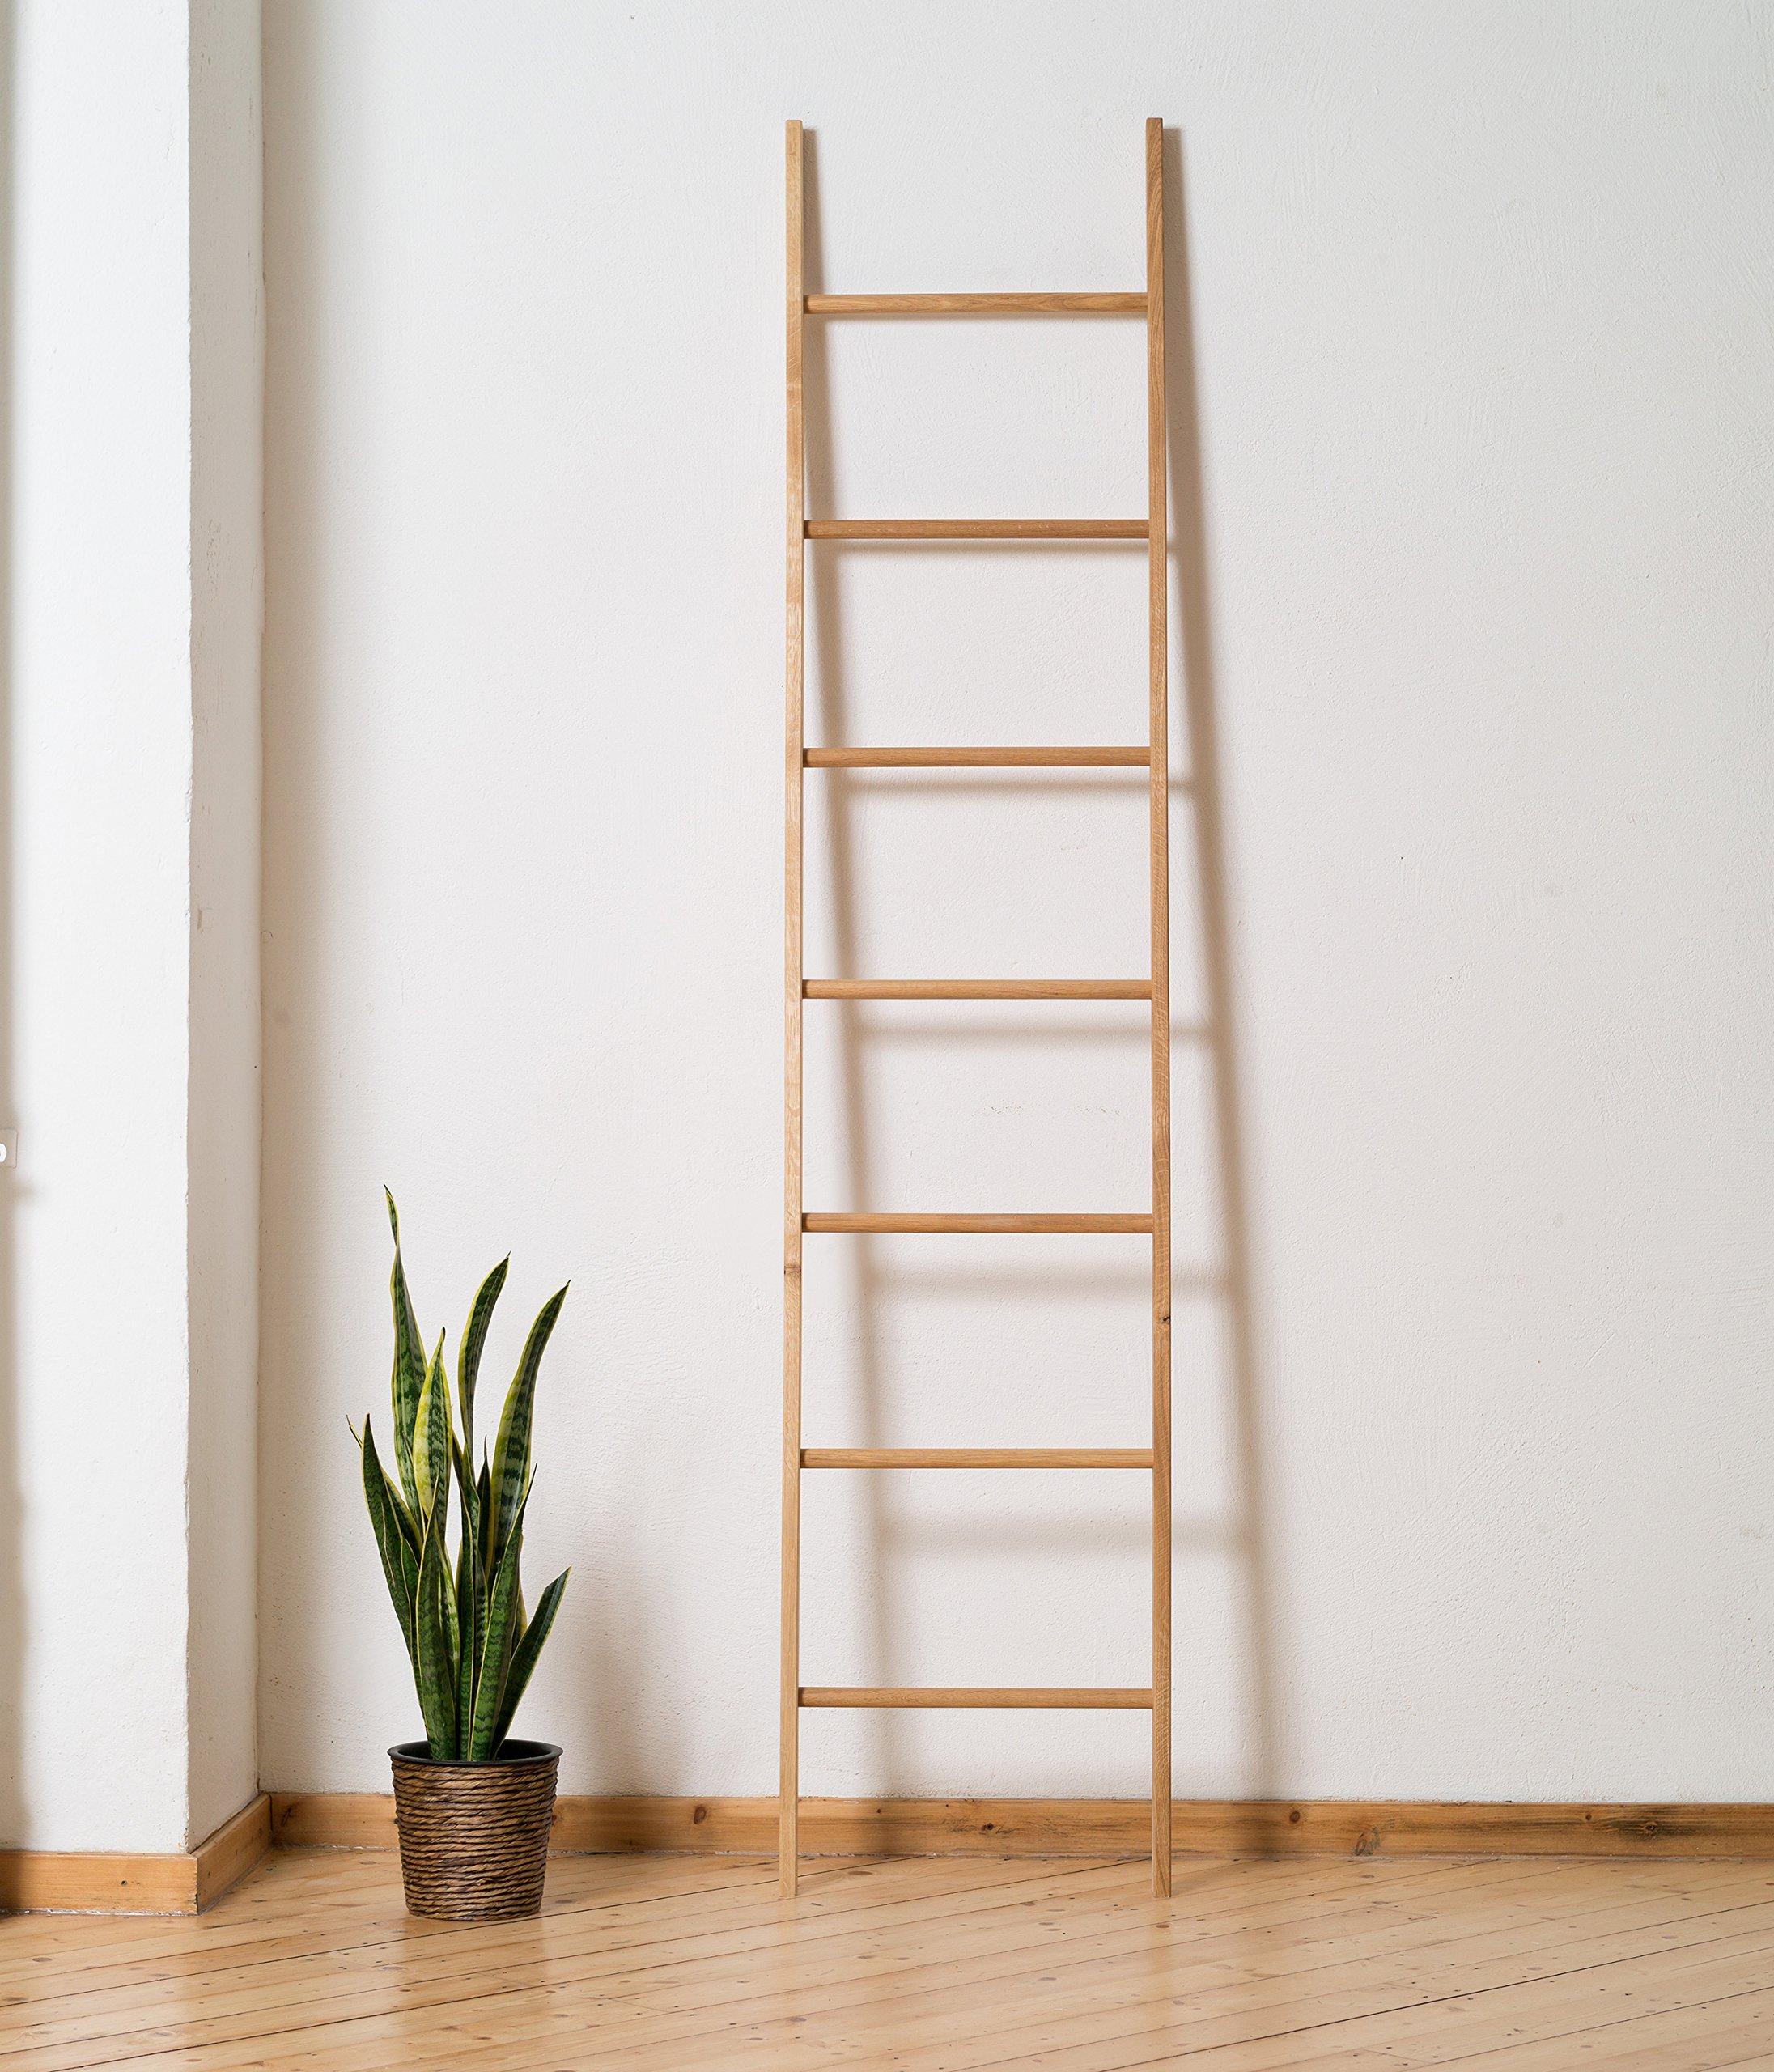 Escalera 212cm de Madera Maciza Roble (hecho en Alemania) Decorativa o como Perchero: Amazon.es: Hogar